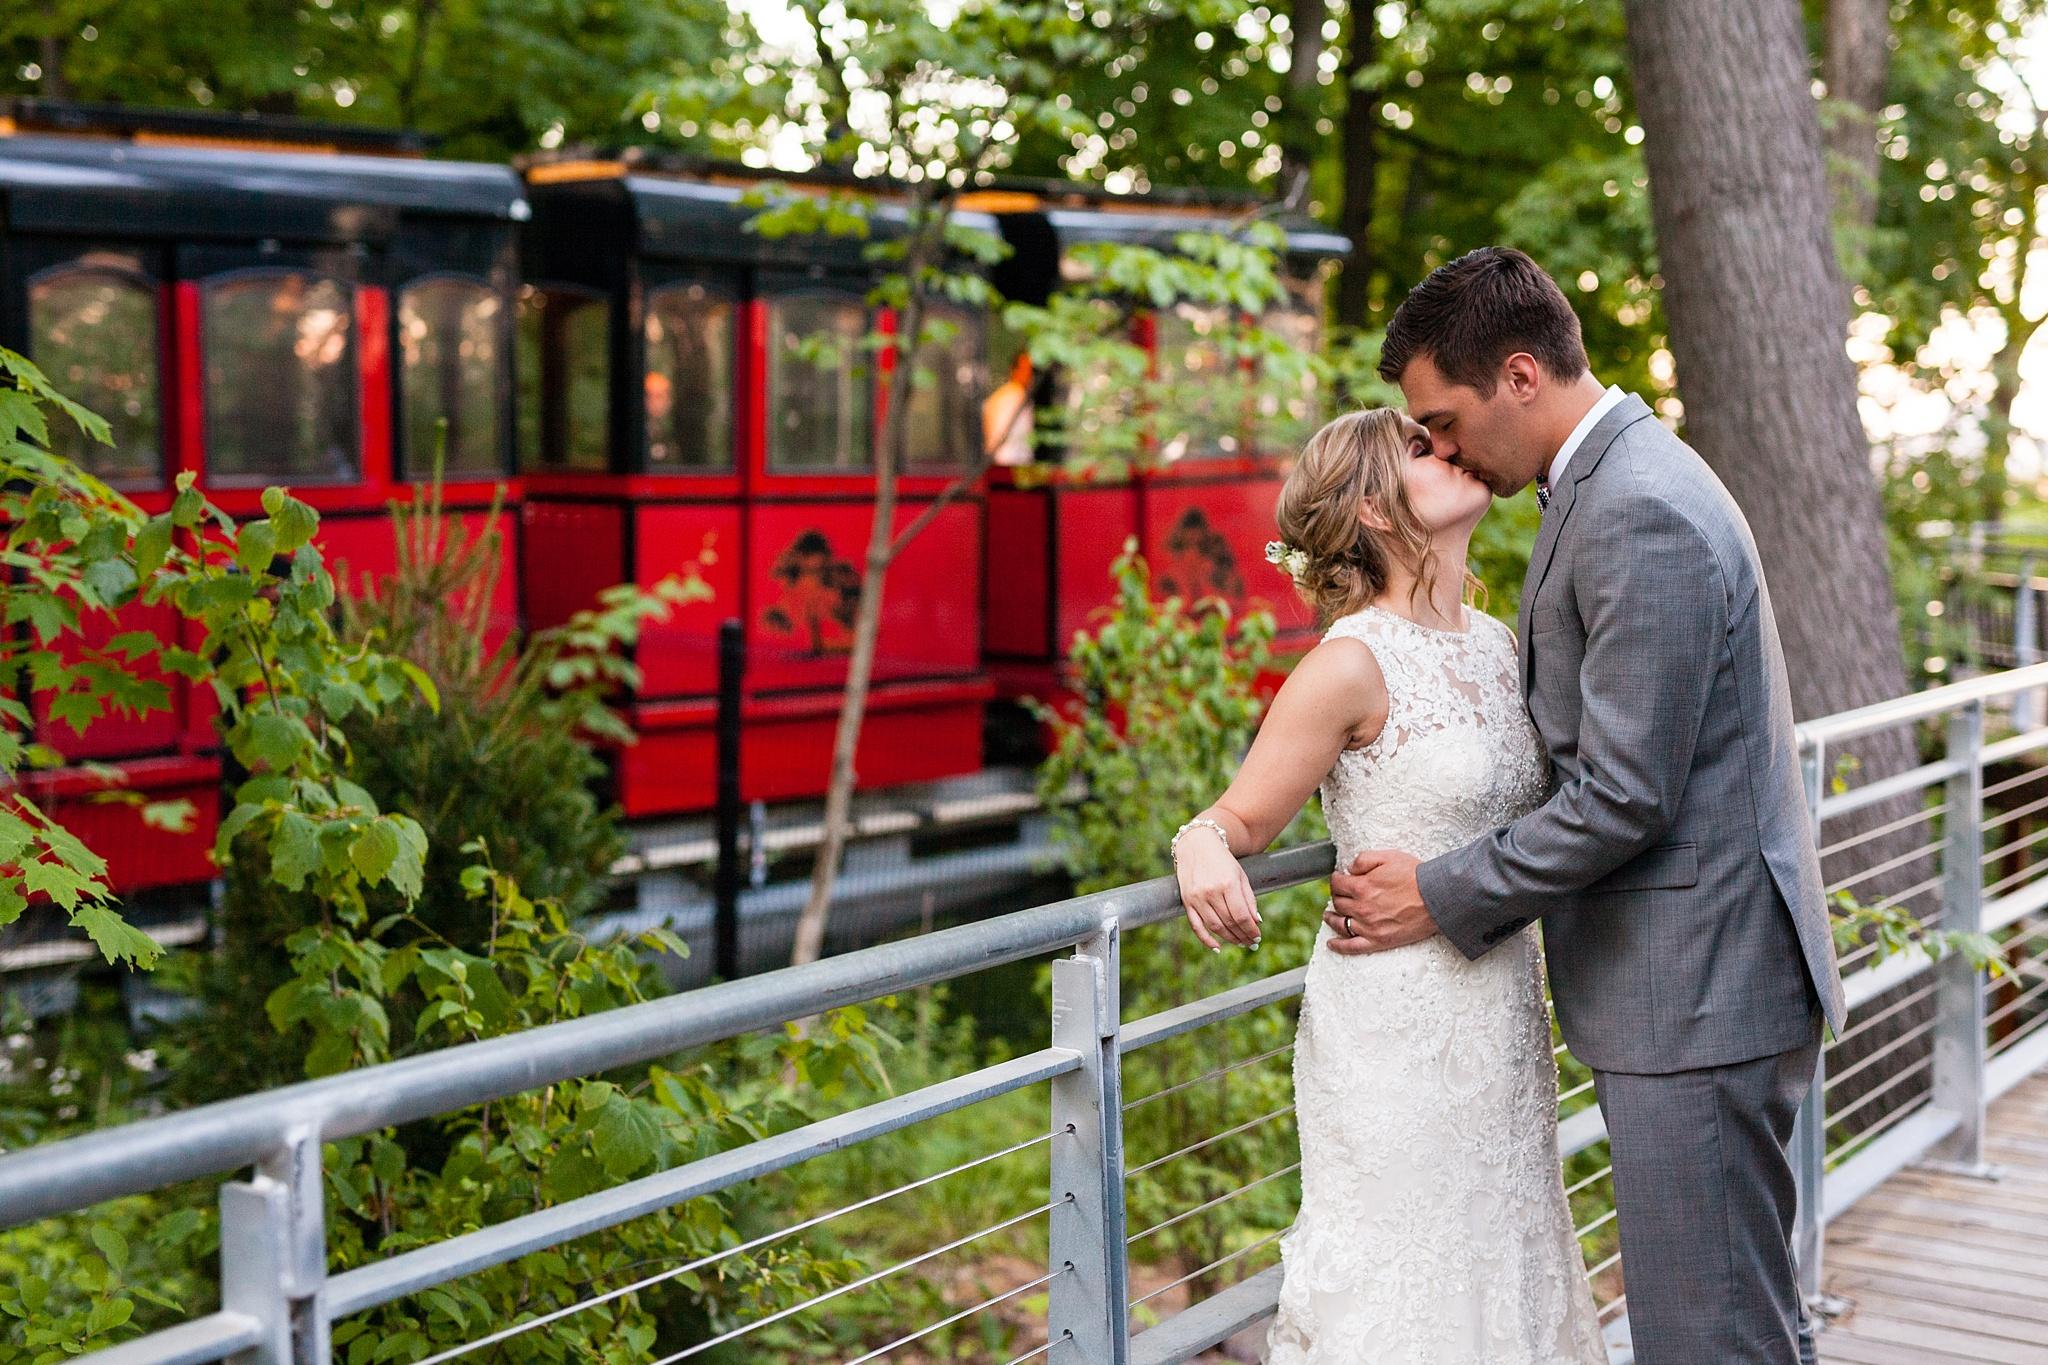 Mandi_Jack_Treehouse_Grand_Rapids_Wedding_0072.jpg